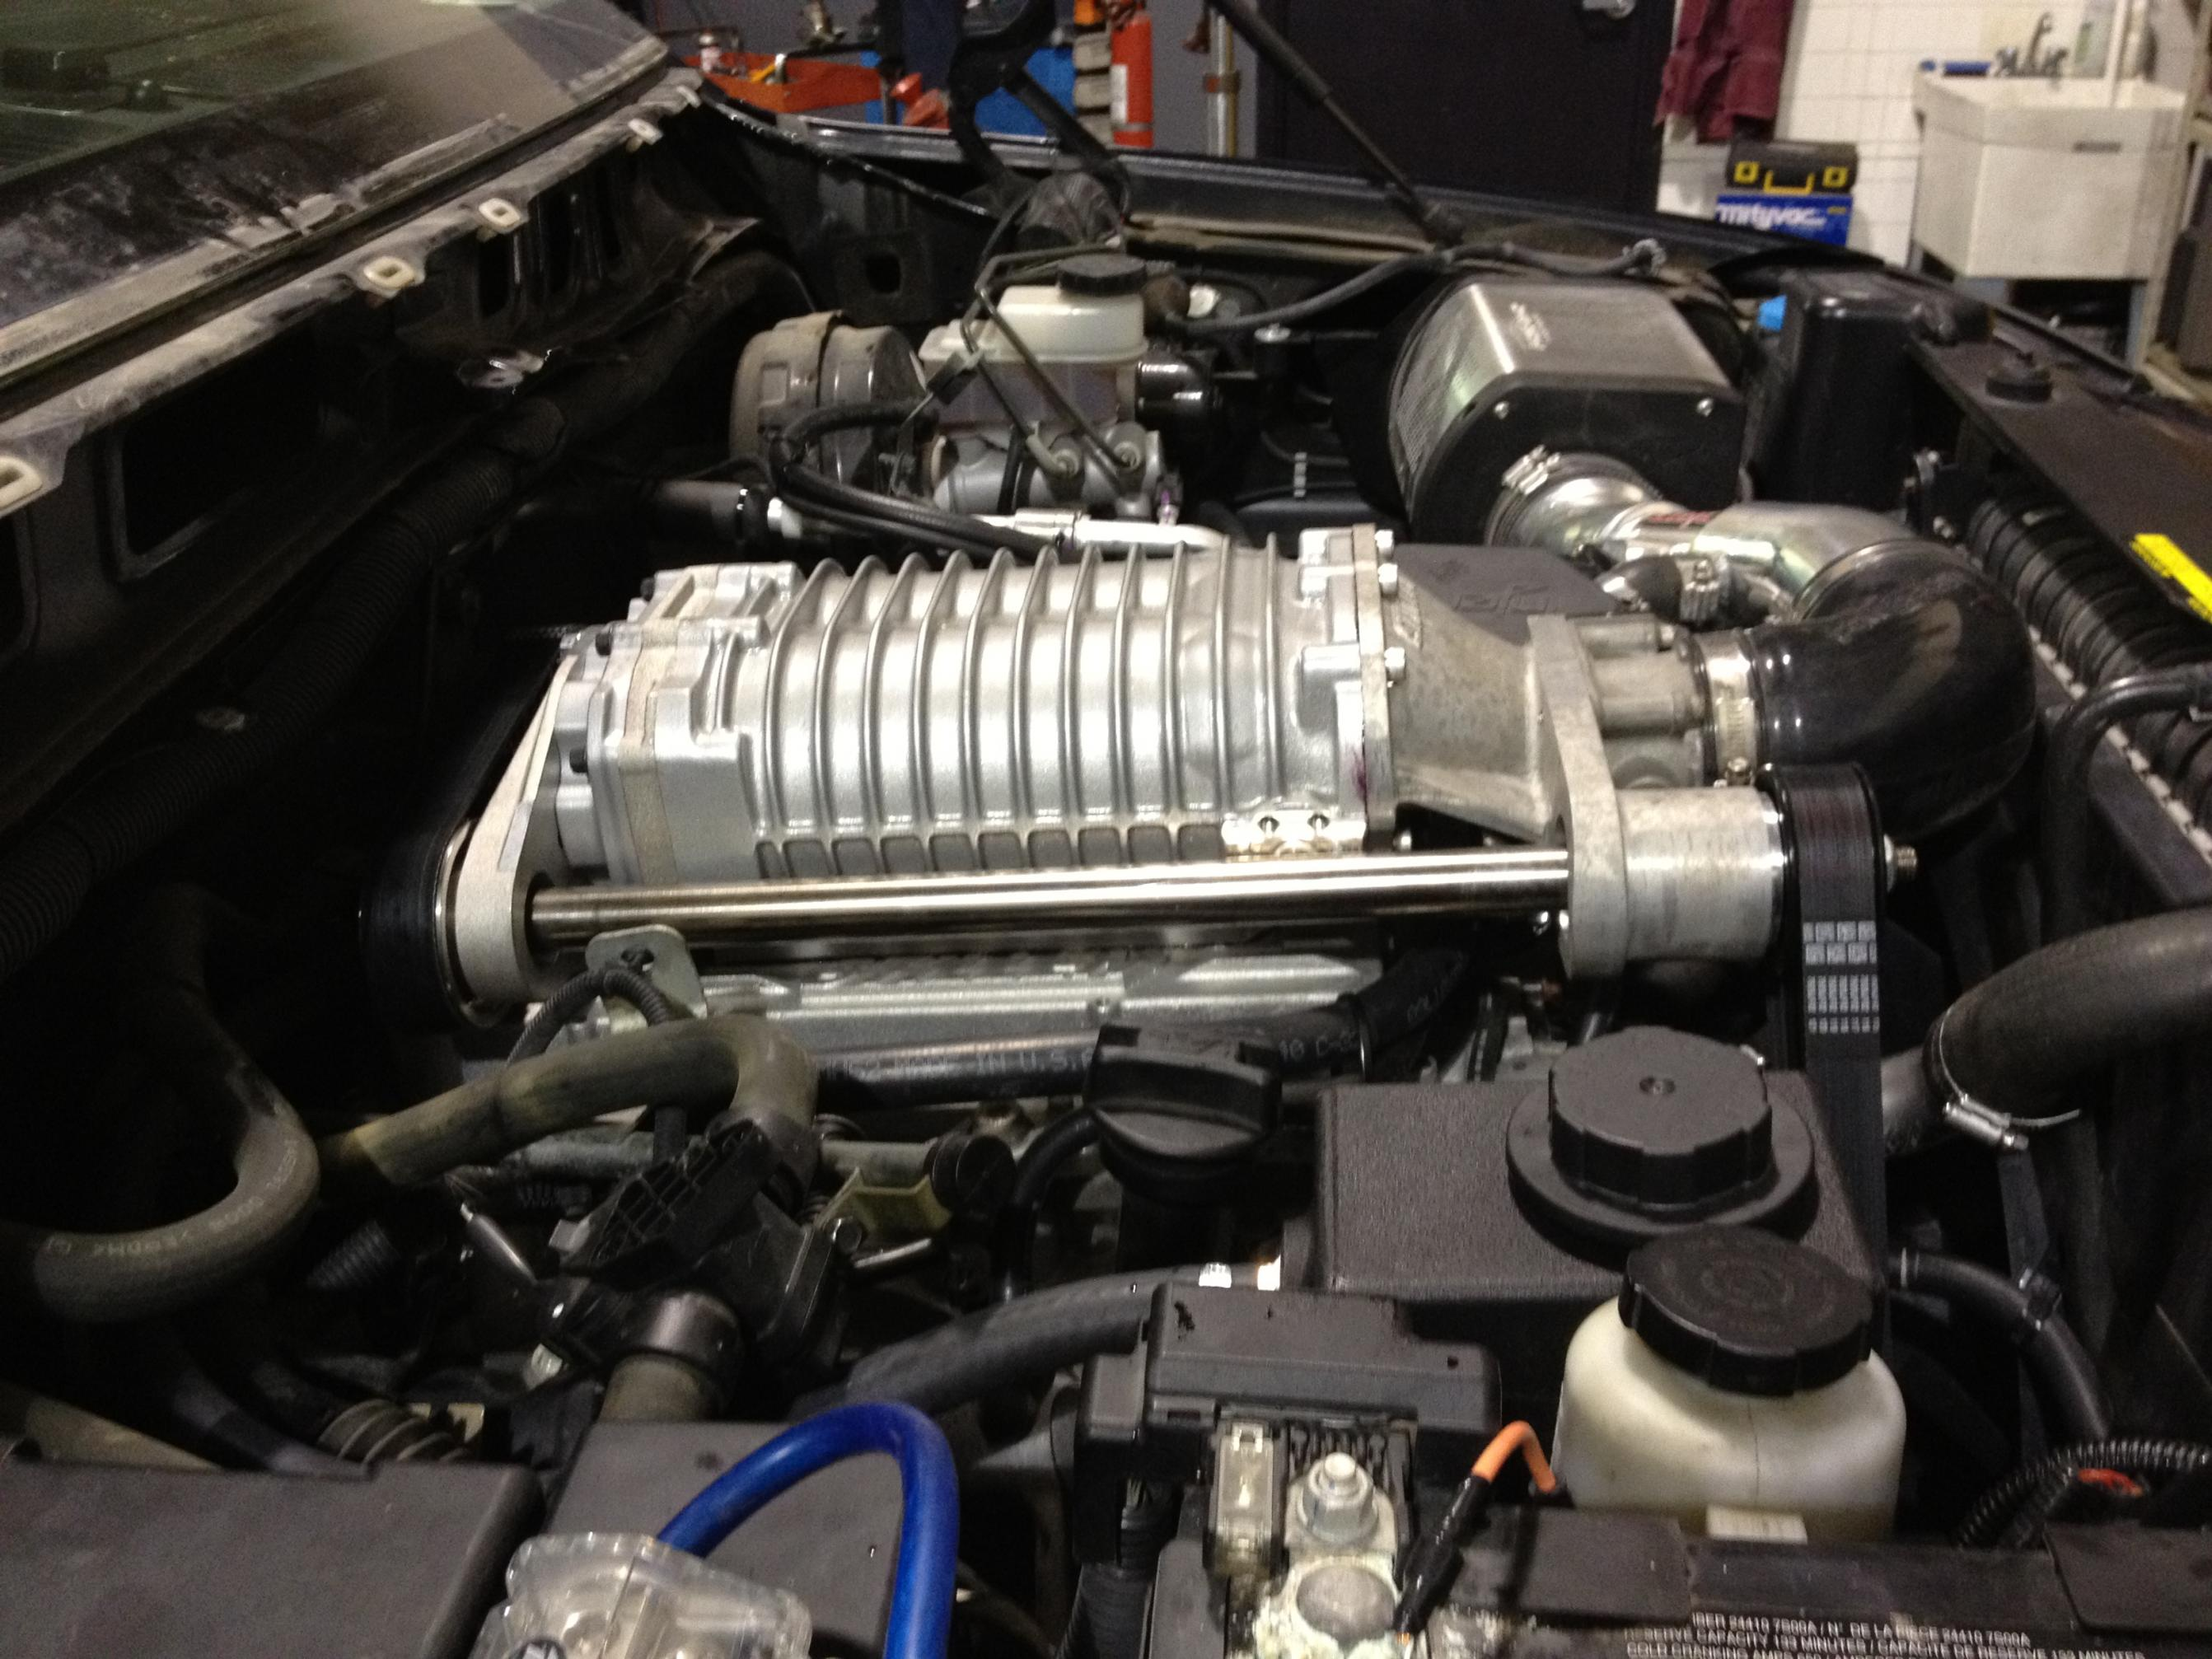 Up-Rev Tuned Supercharged Titan - Nissan Titan Forum